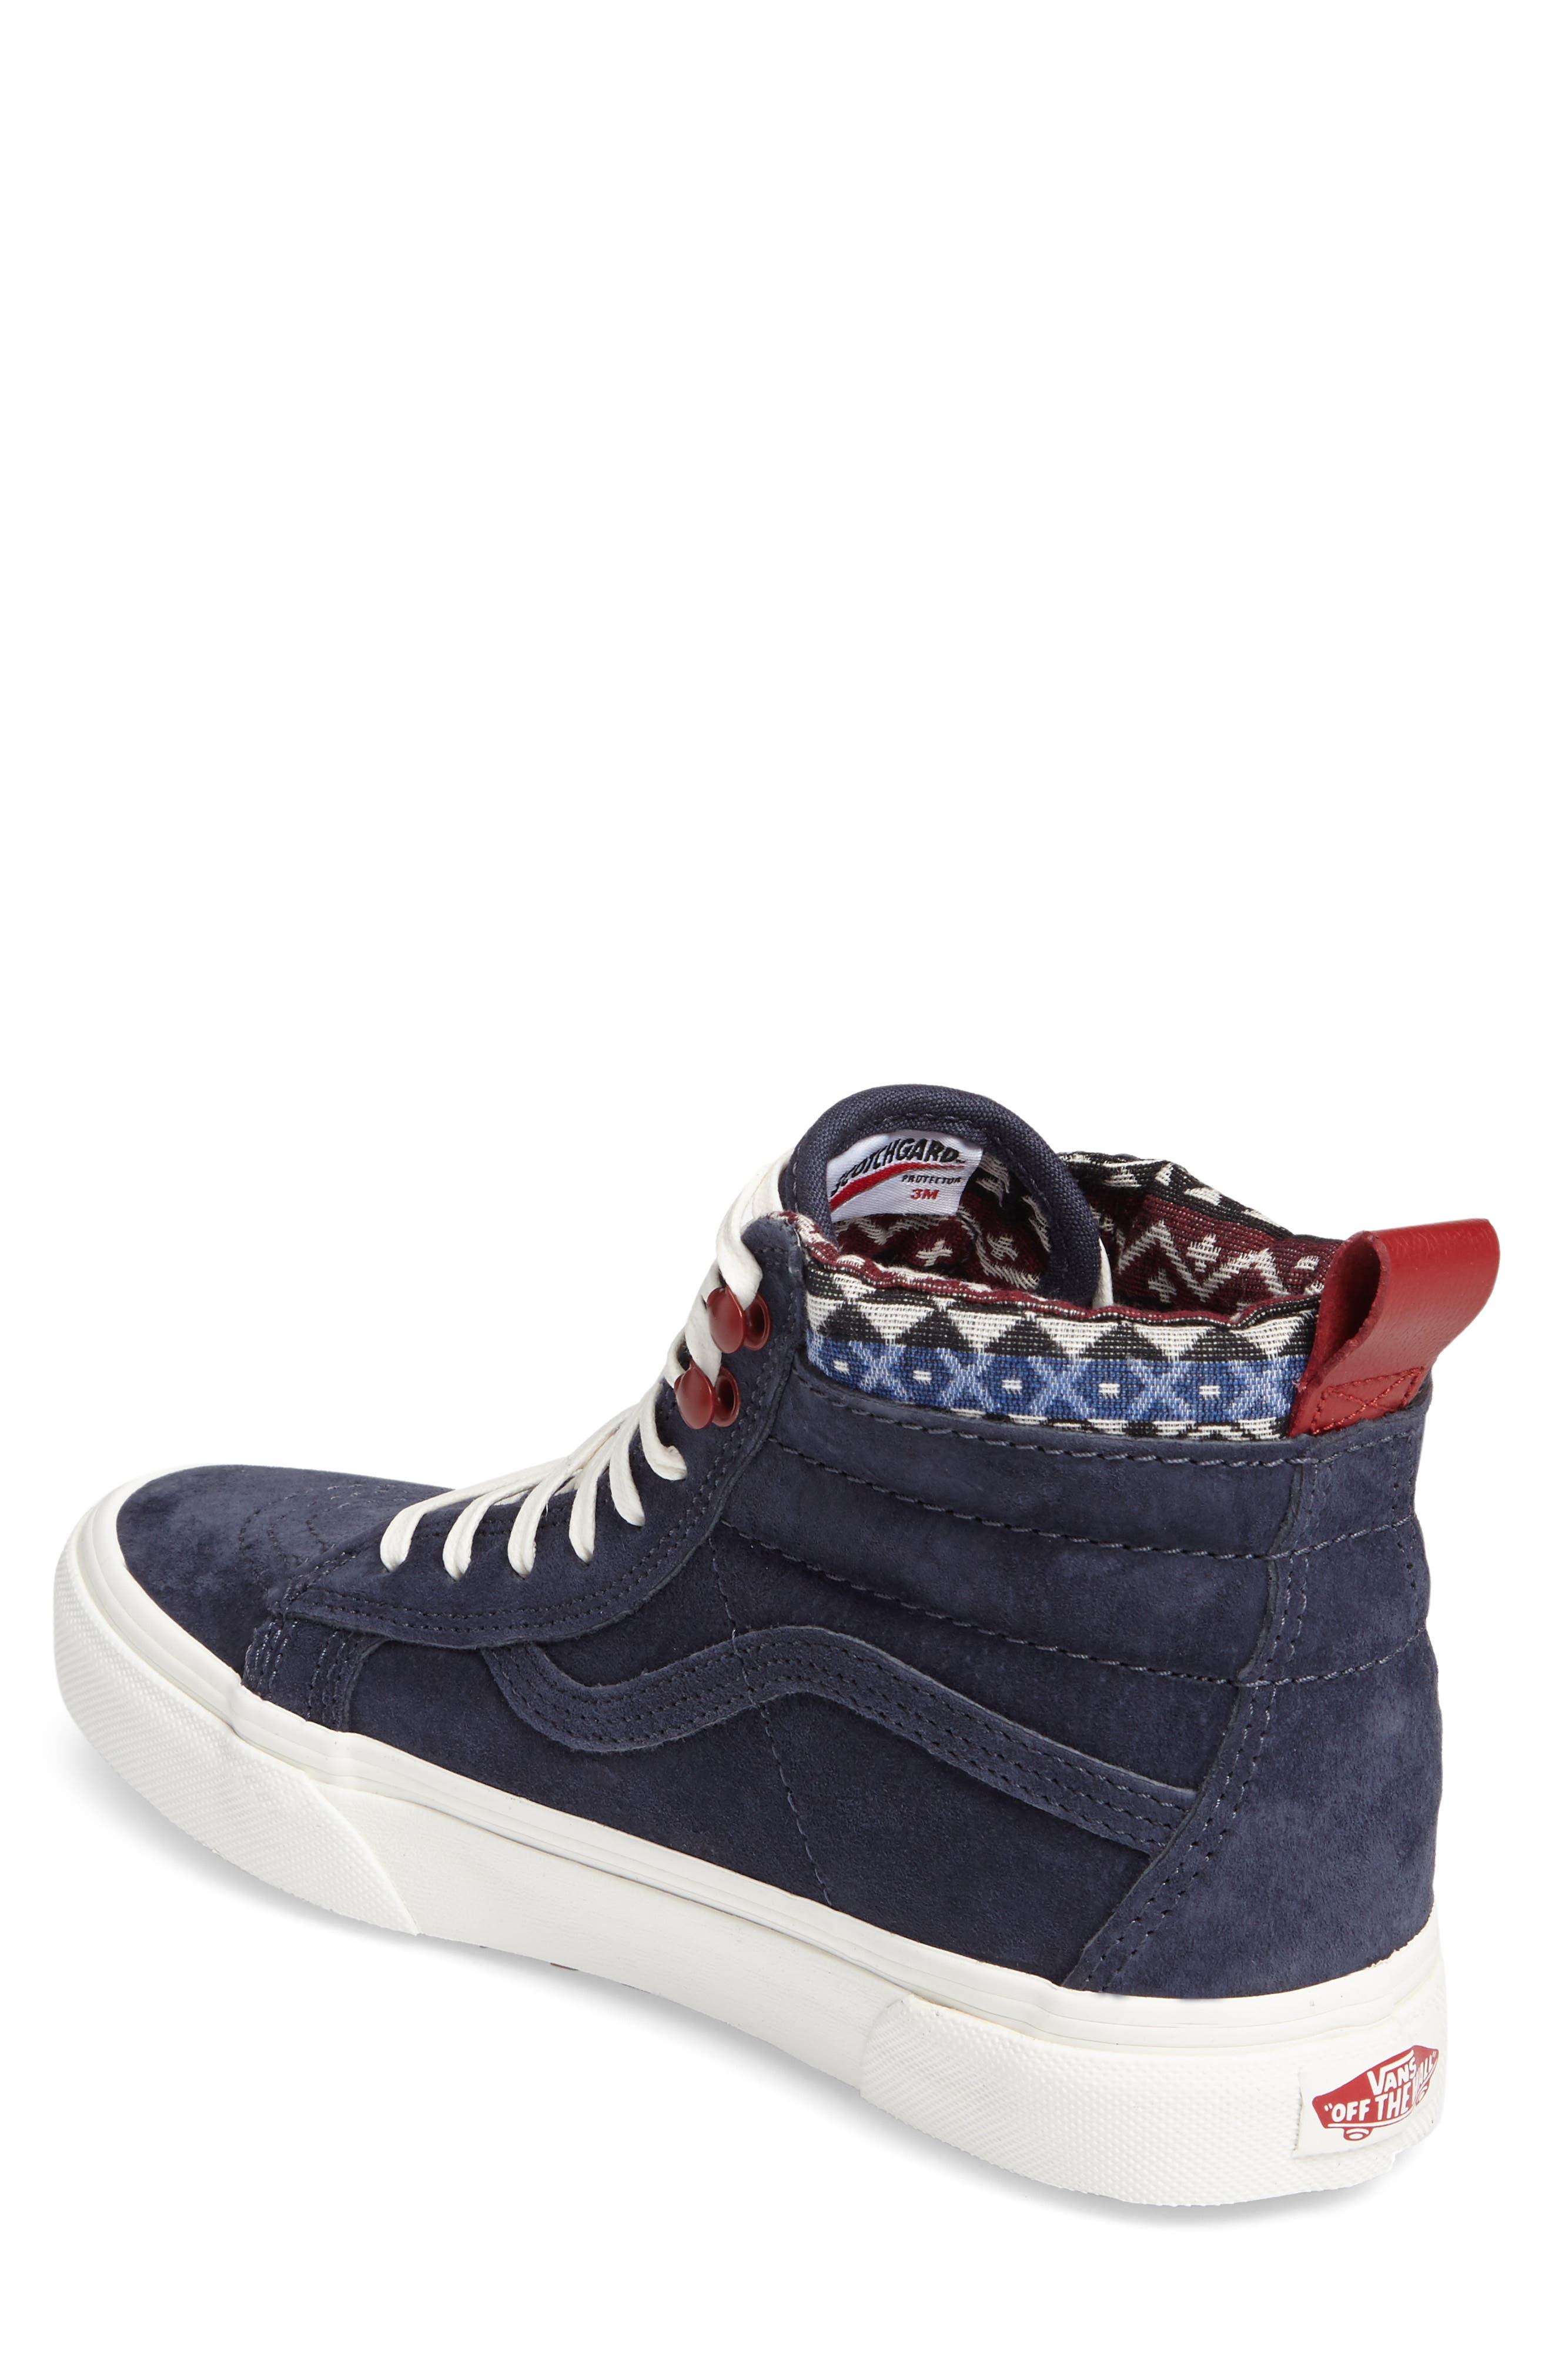 Sk-8 Hi MTE Sneaker,                             Alternate thumbnail 2, color,                             Parisian Night/ Blue Suede